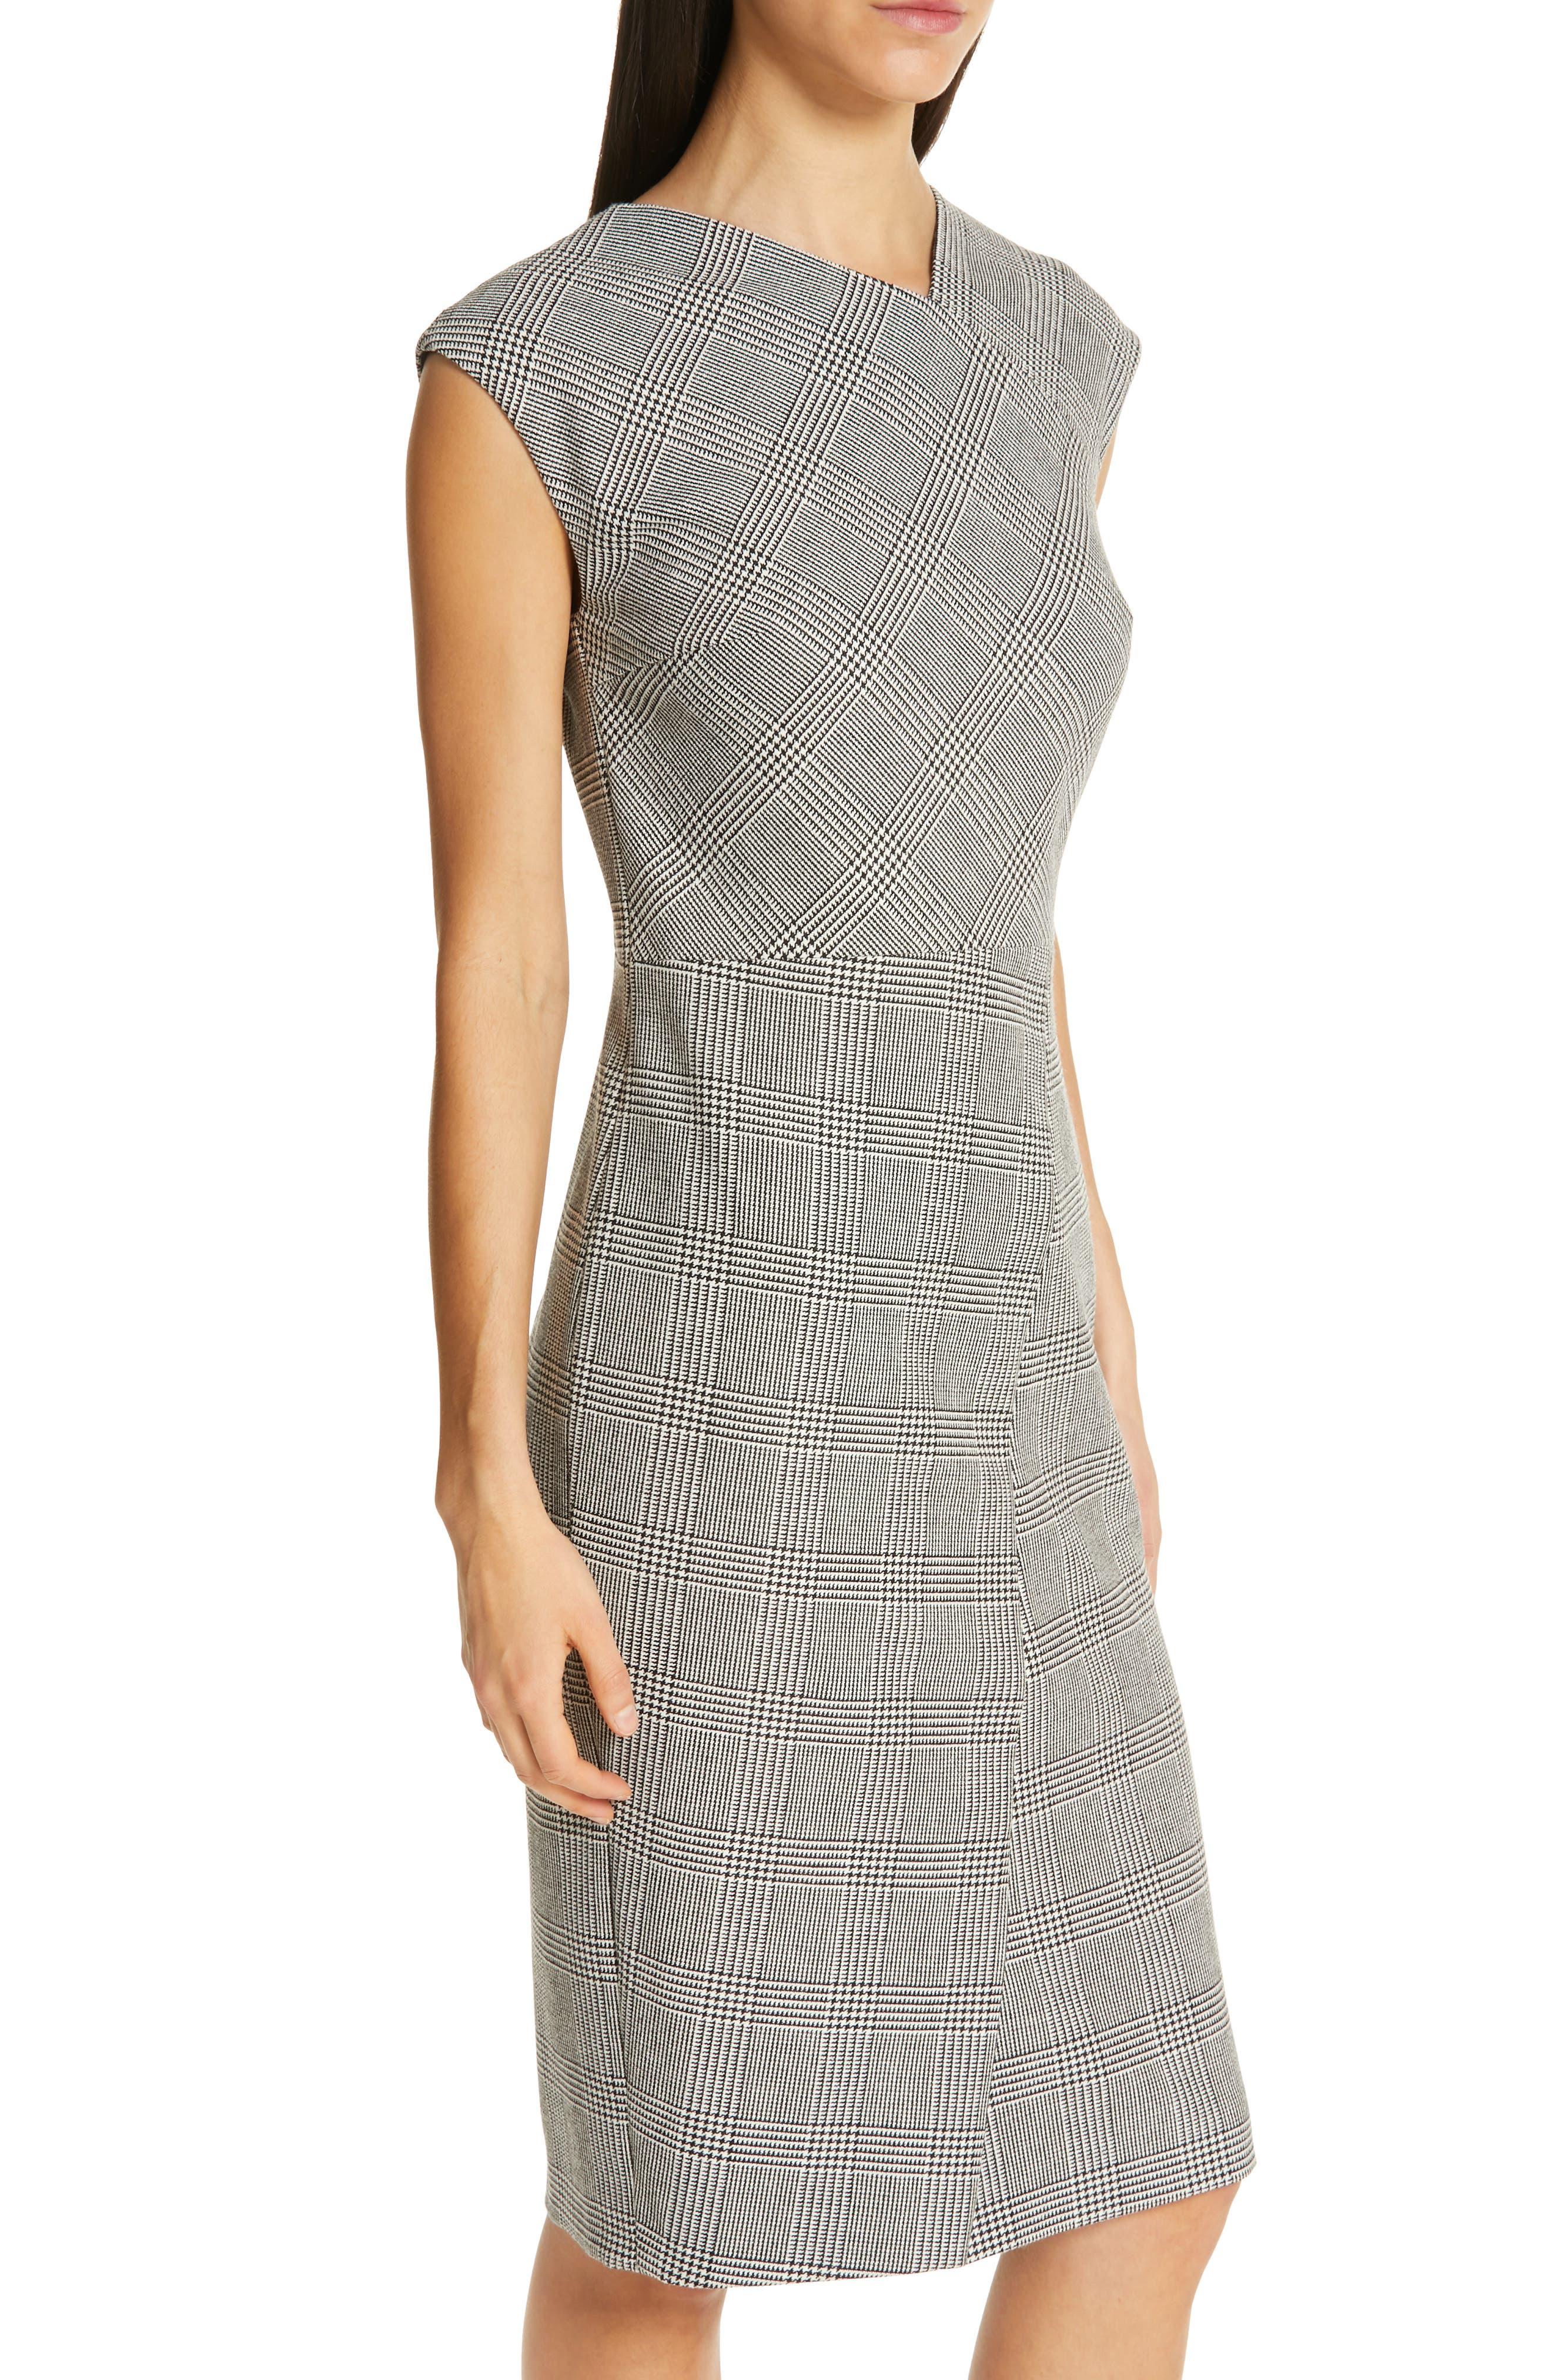 BOSS, Dechesta Glen Plaid Sheath Dress, Alternate thumbnail 5, color, 020